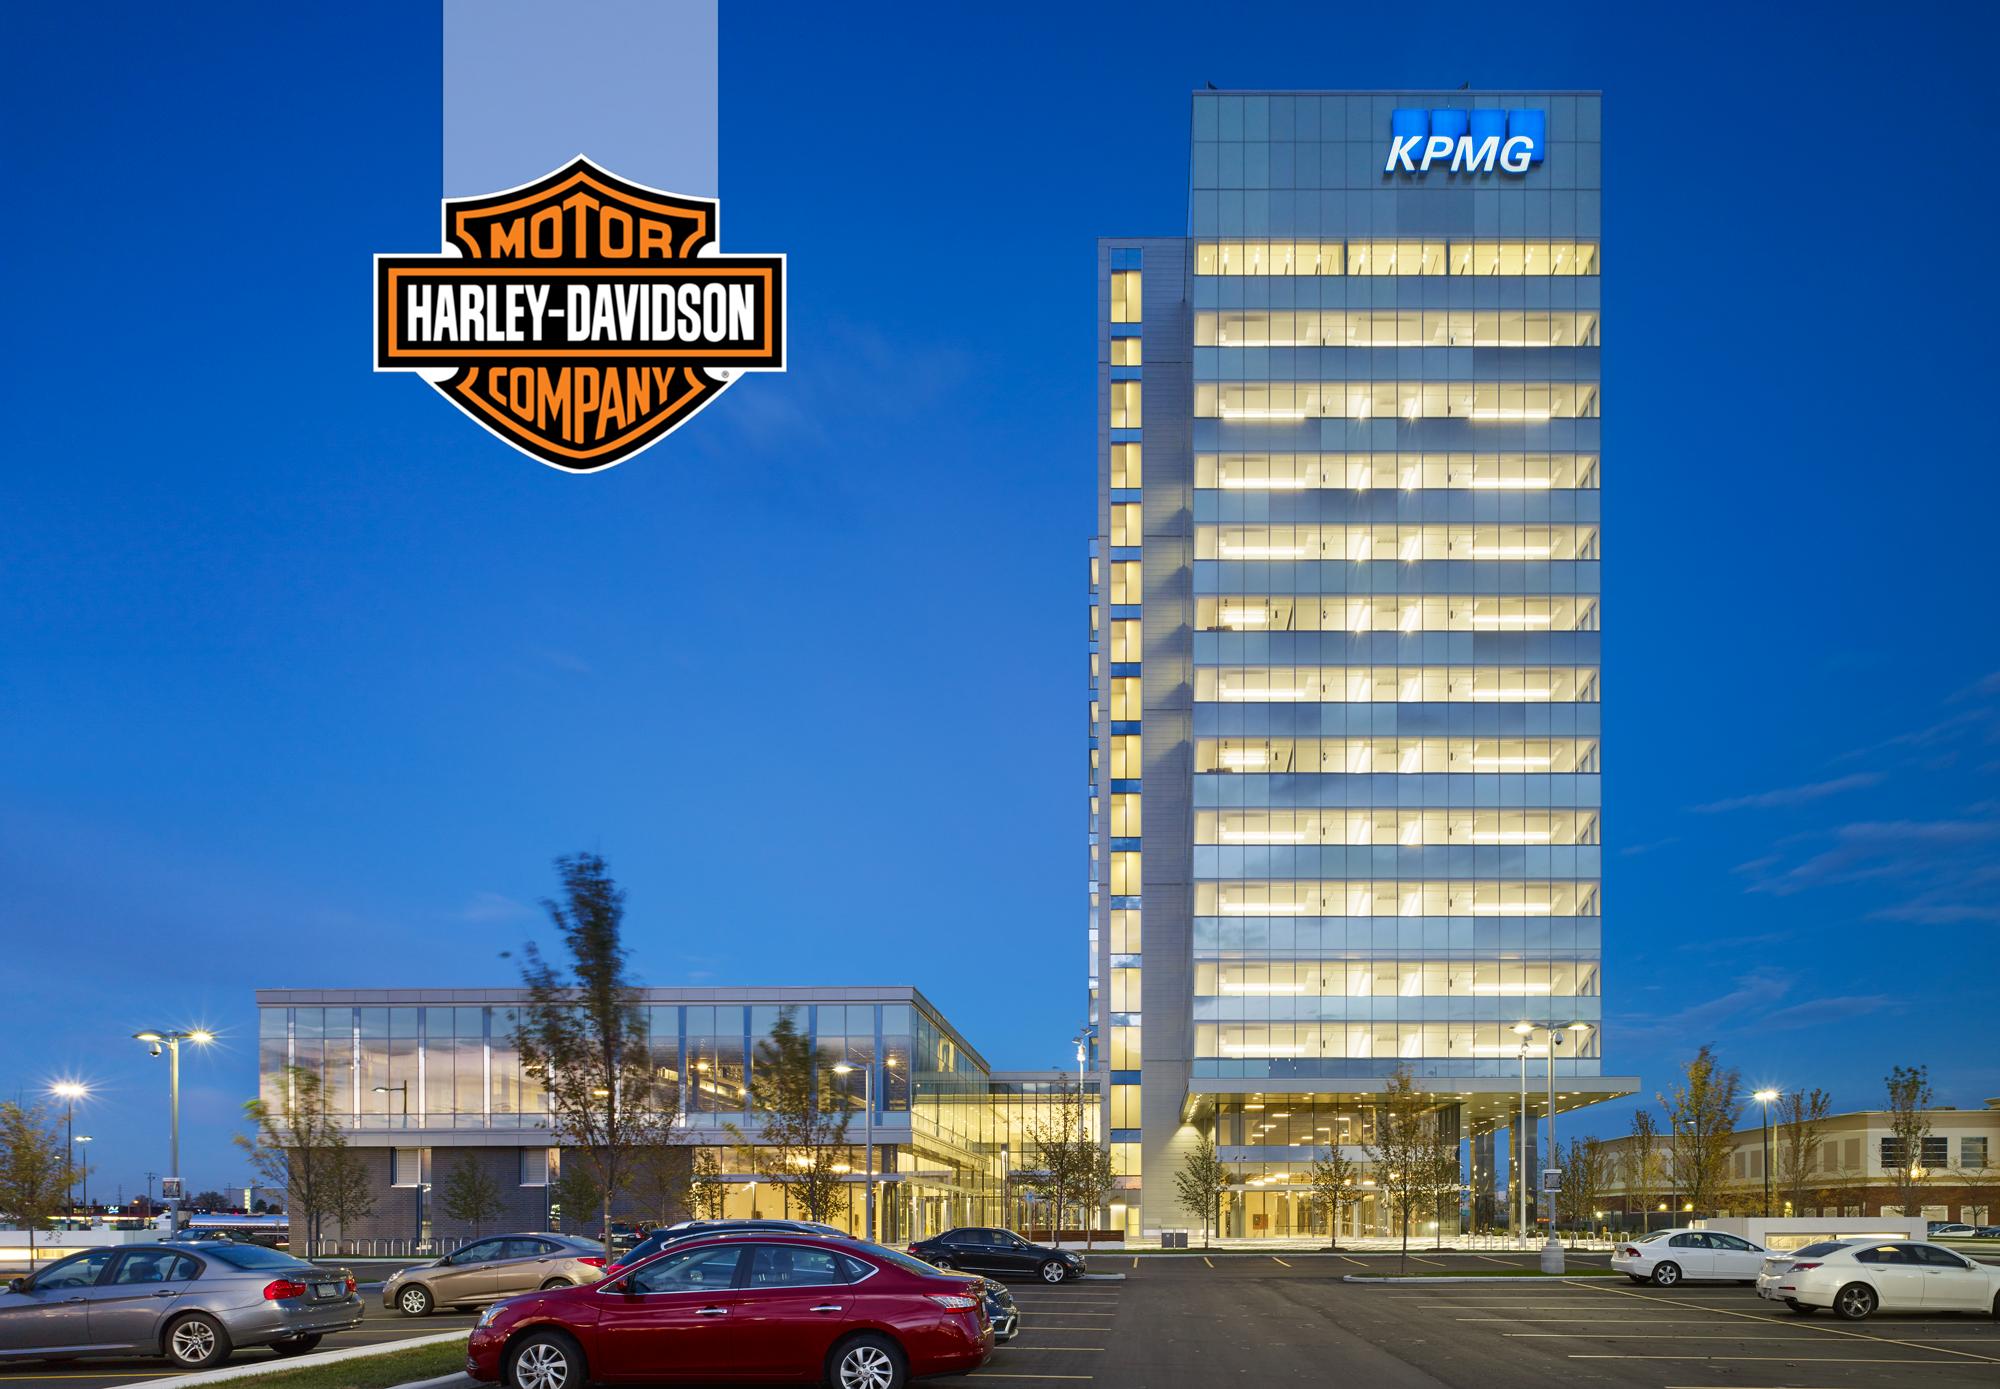 KPMG Tower , Harley Davidson